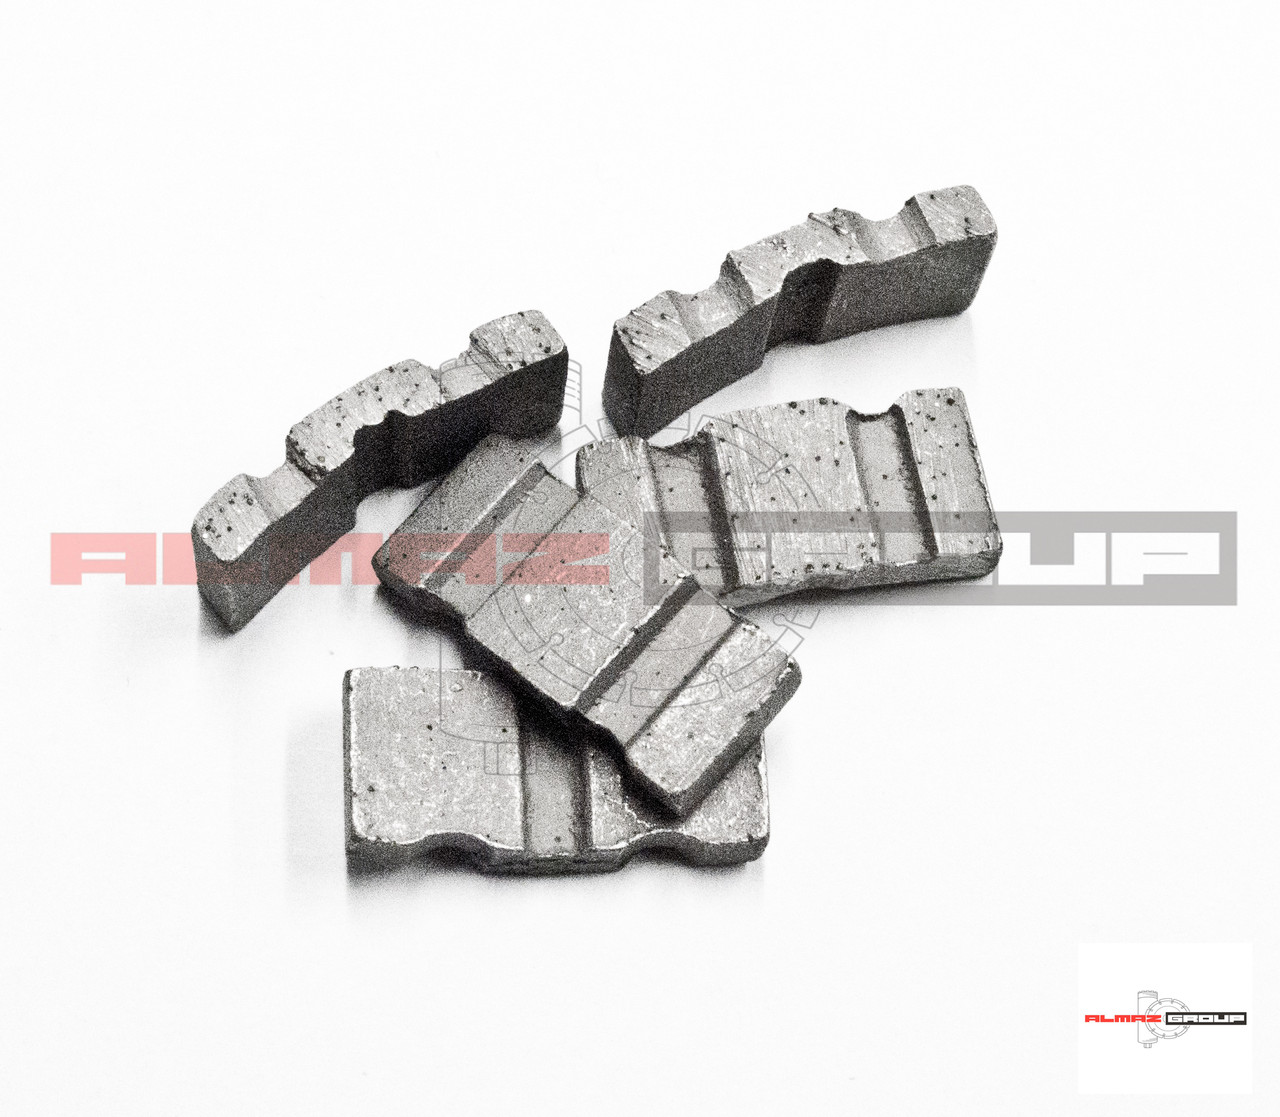 Реставрация алмазных коронок Ø 132 методом напайки сегмента  TURBO-X